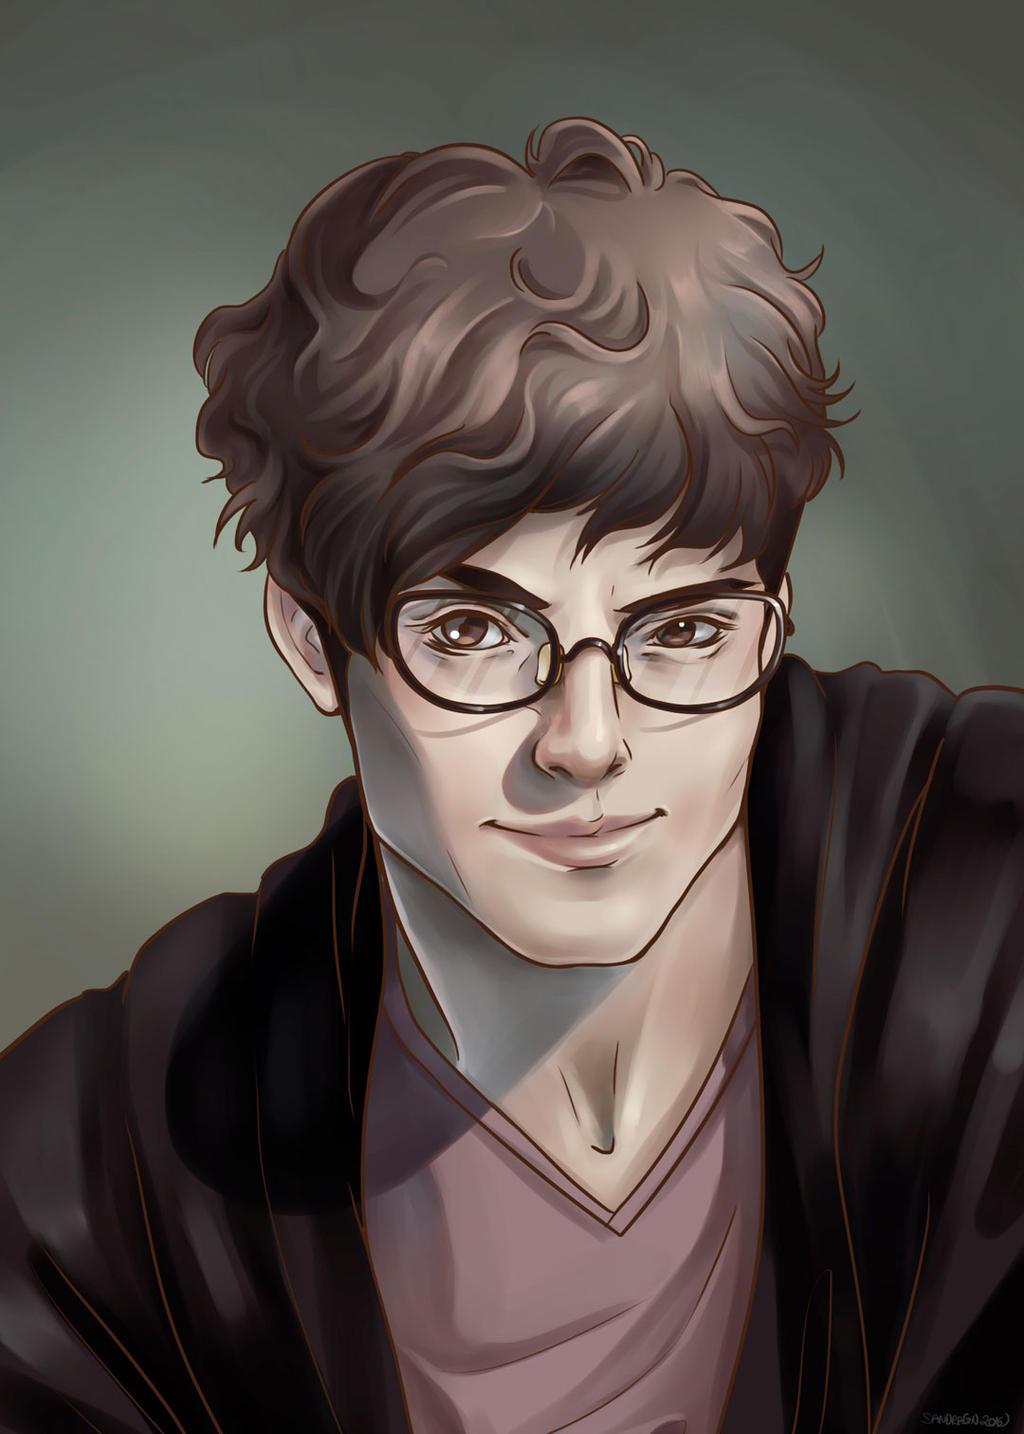 James Potter on James-x-Sirius - DeviantArt